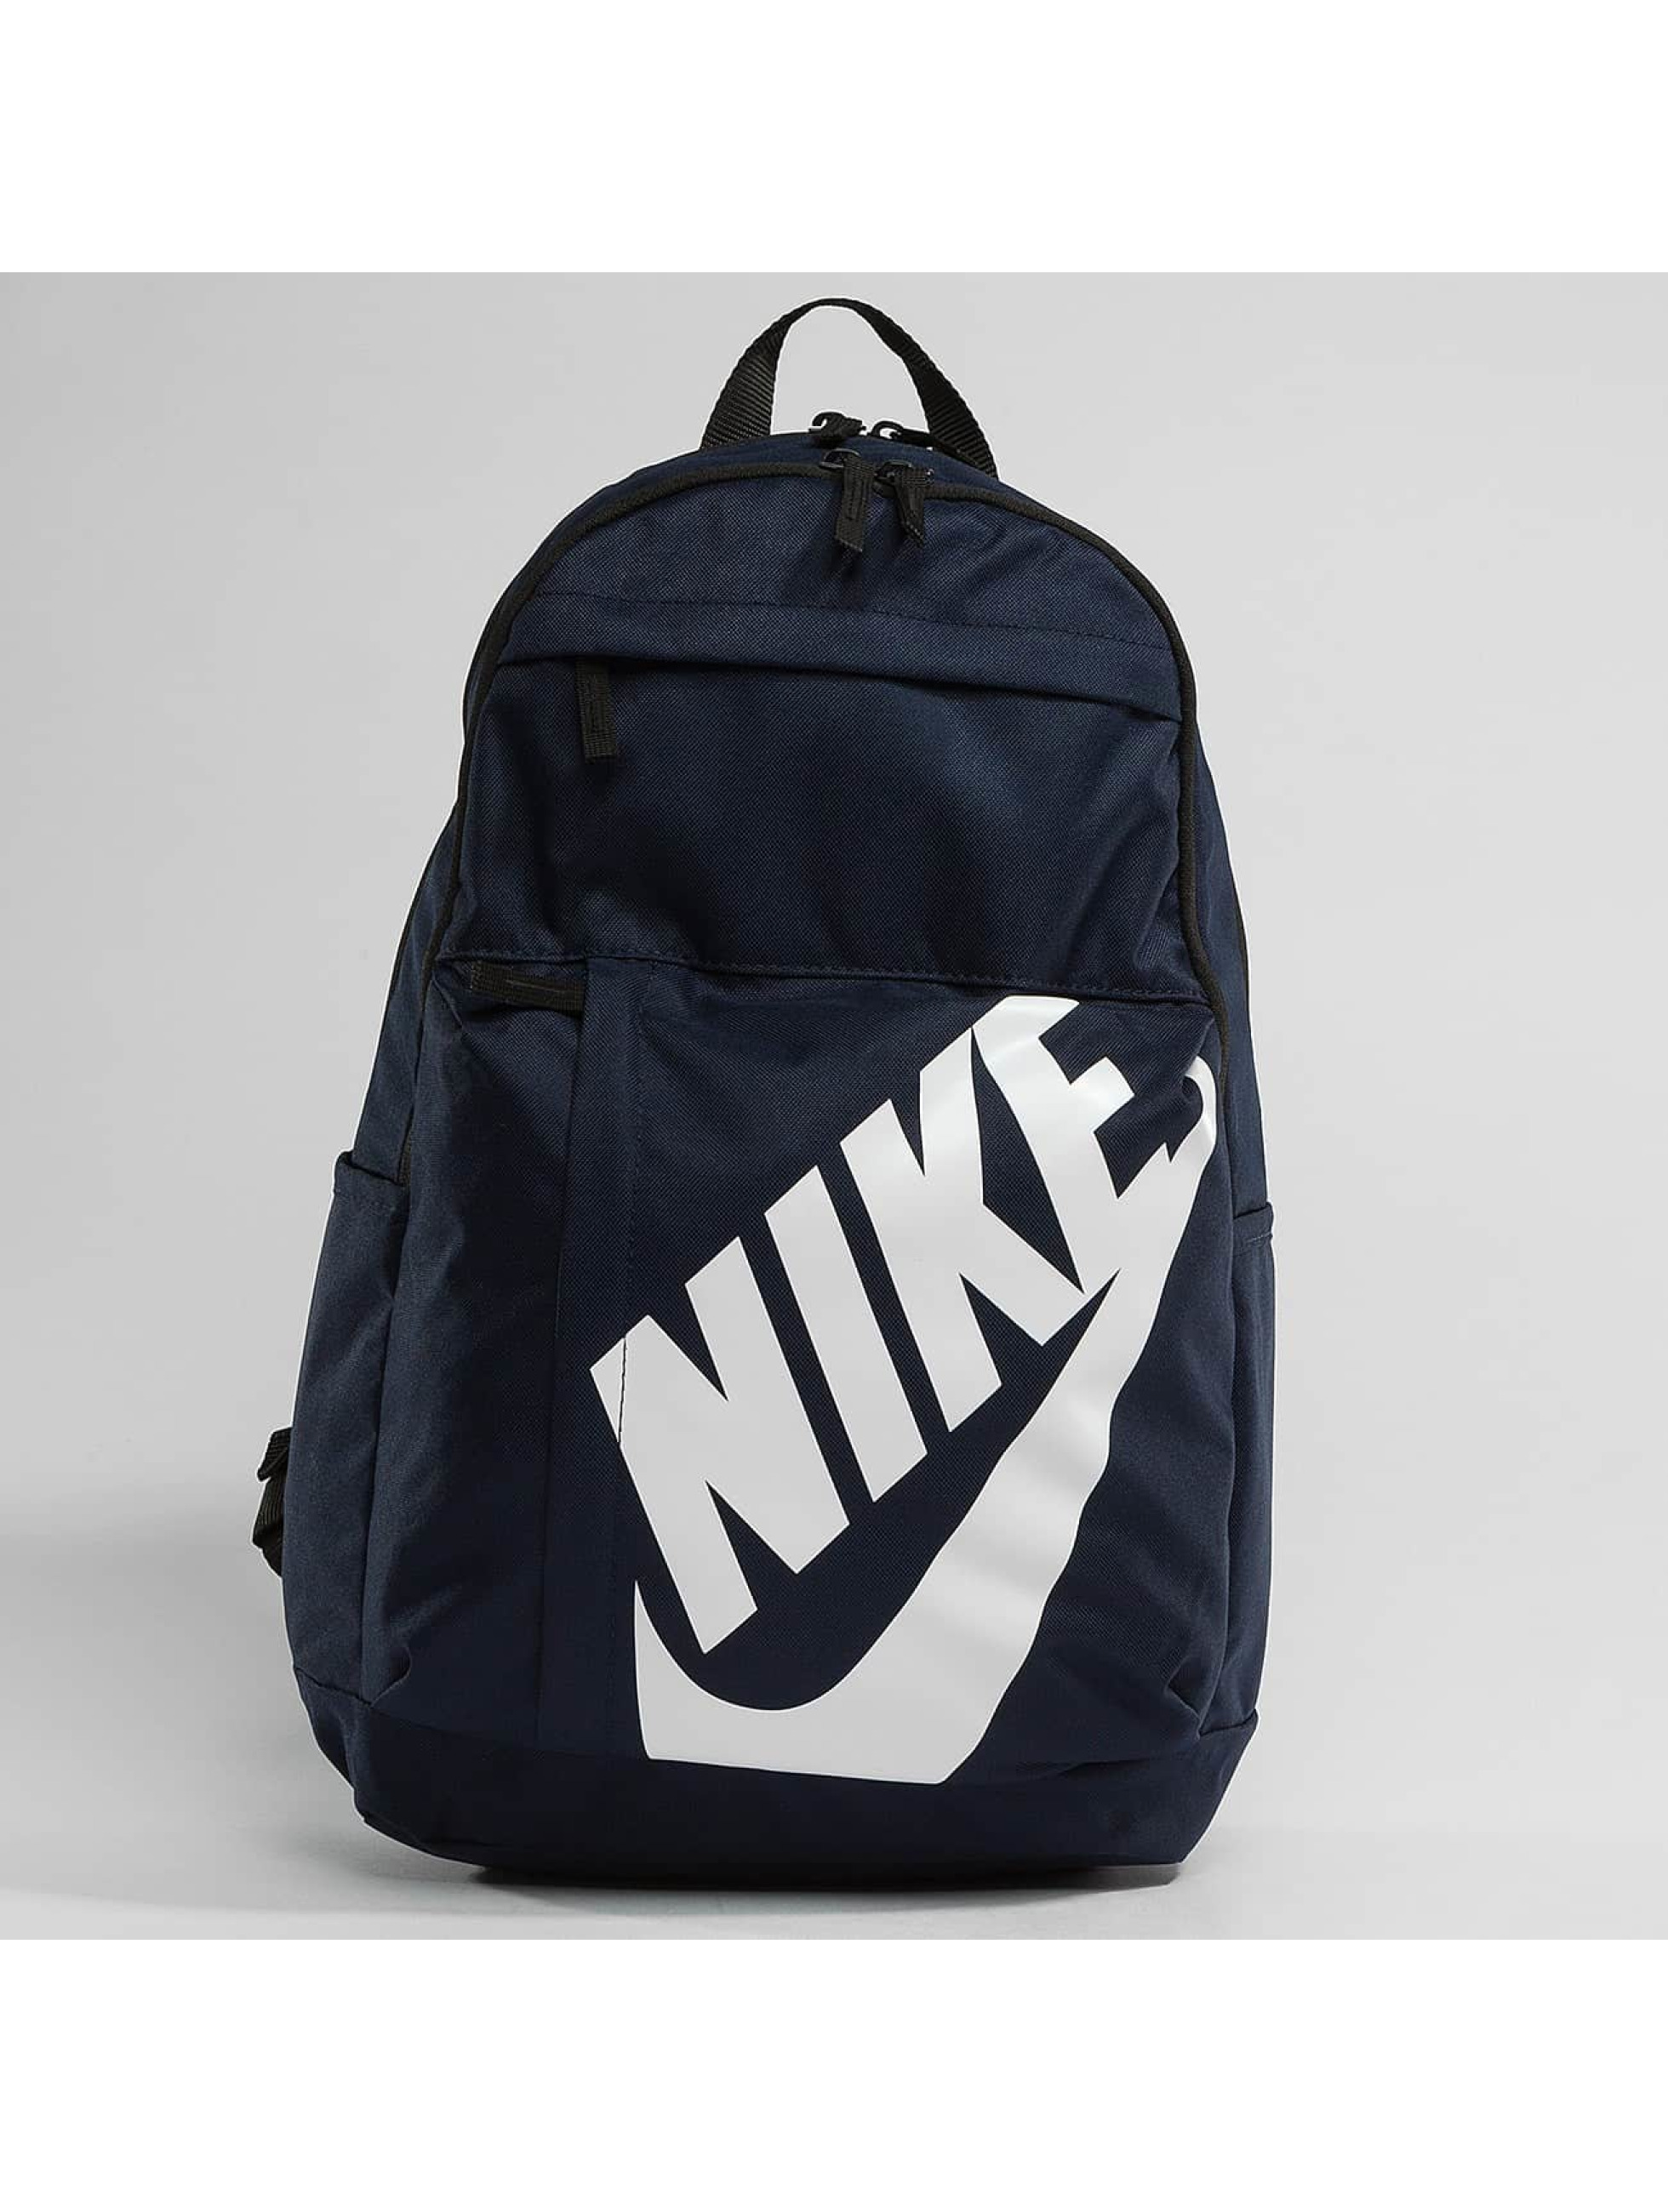 Nike Männer,Frauen Rucksack Elemental in blau